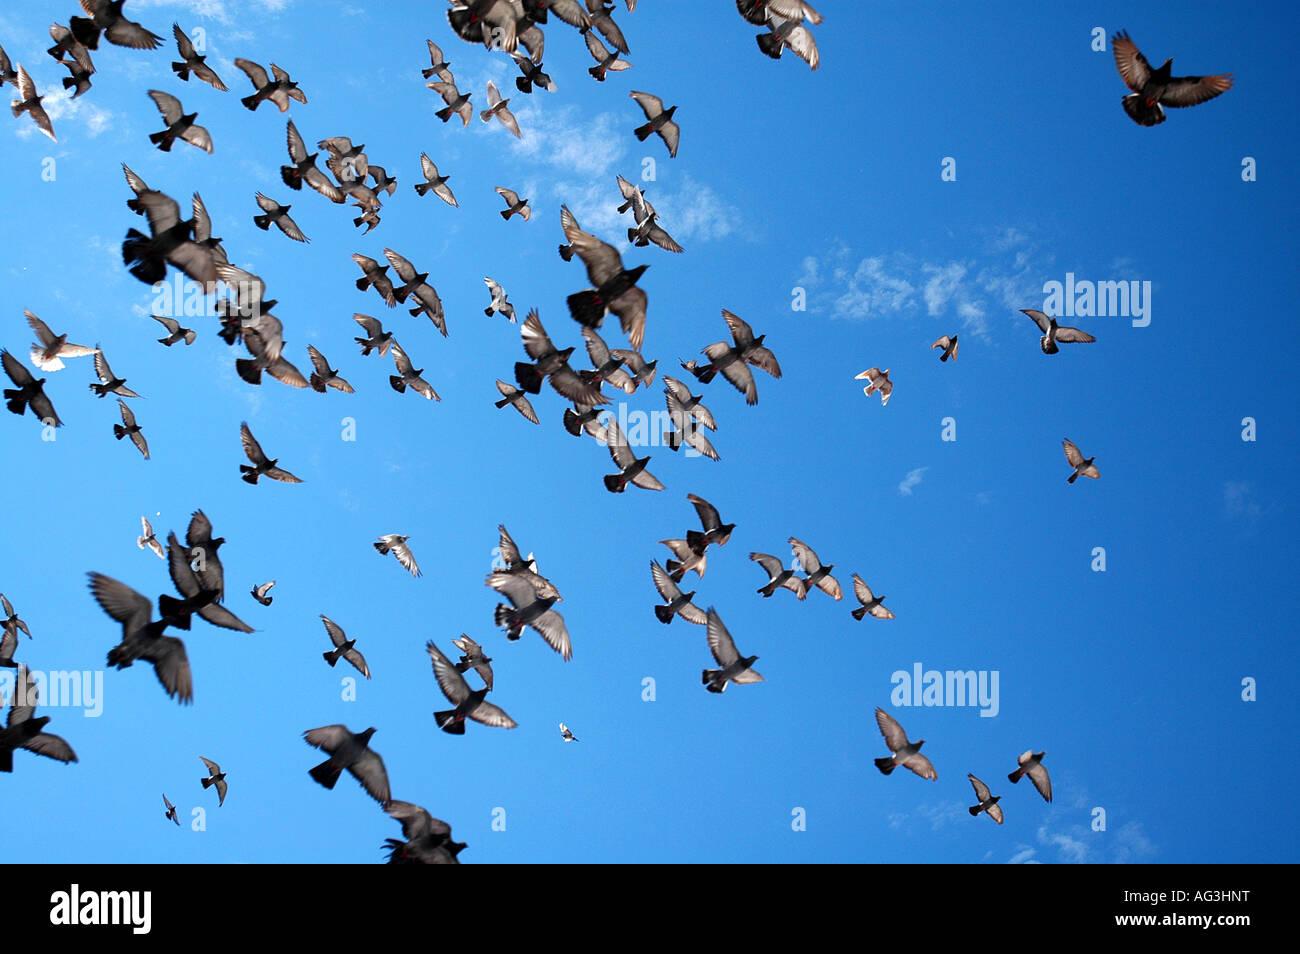 Vögel fliegen über der alten Stadt Dubtrovnik, Kroatien Stockbild